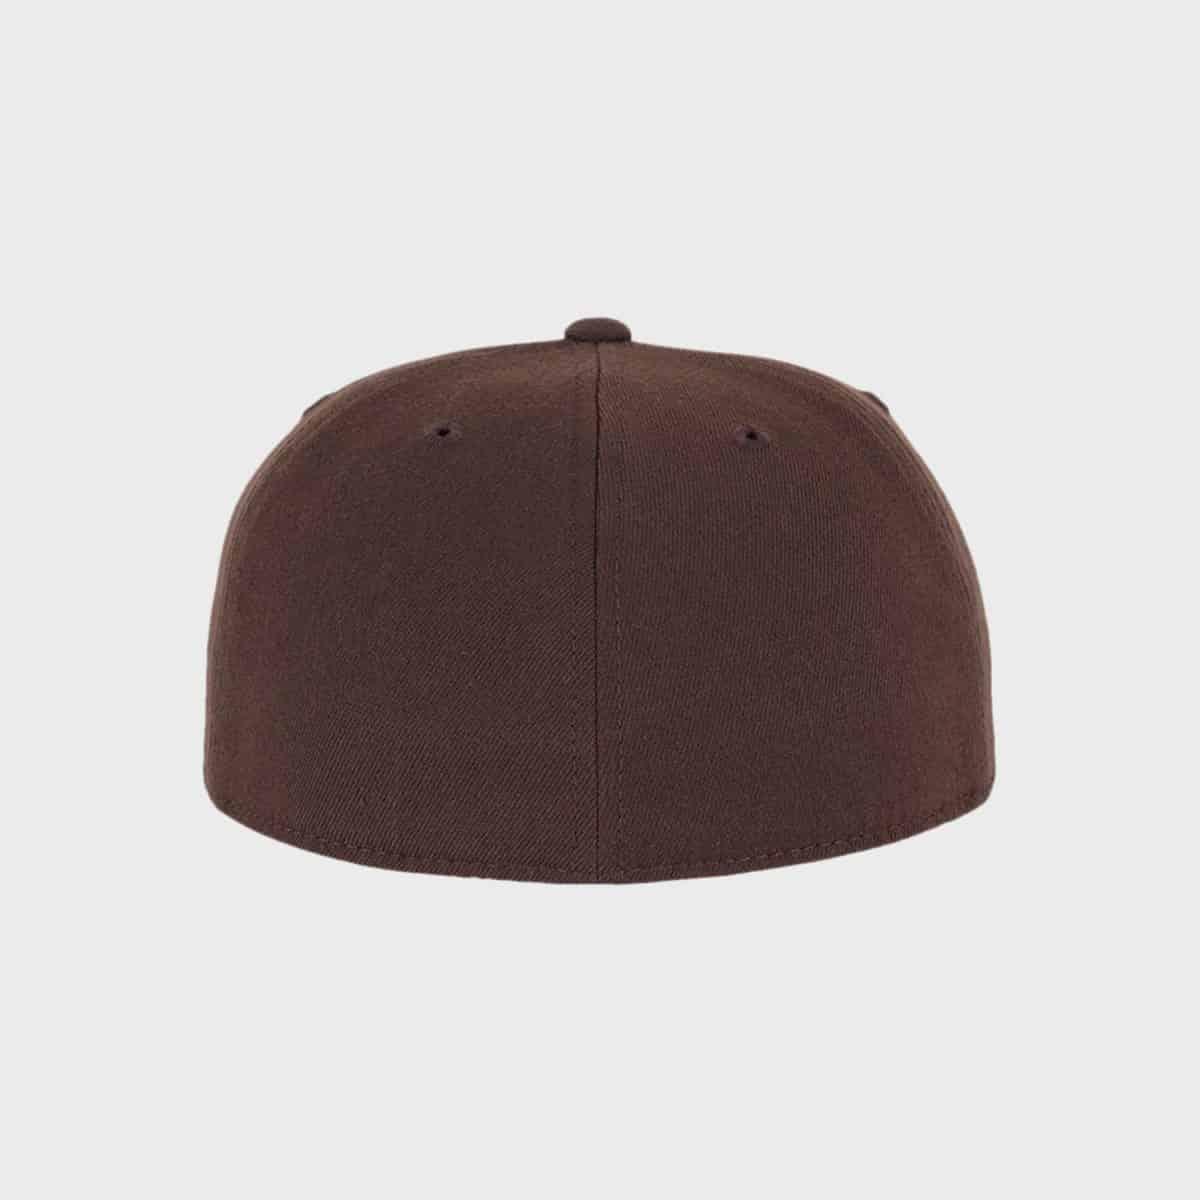 Flexfit FlexfitCaps FFE 6210 Brown Back